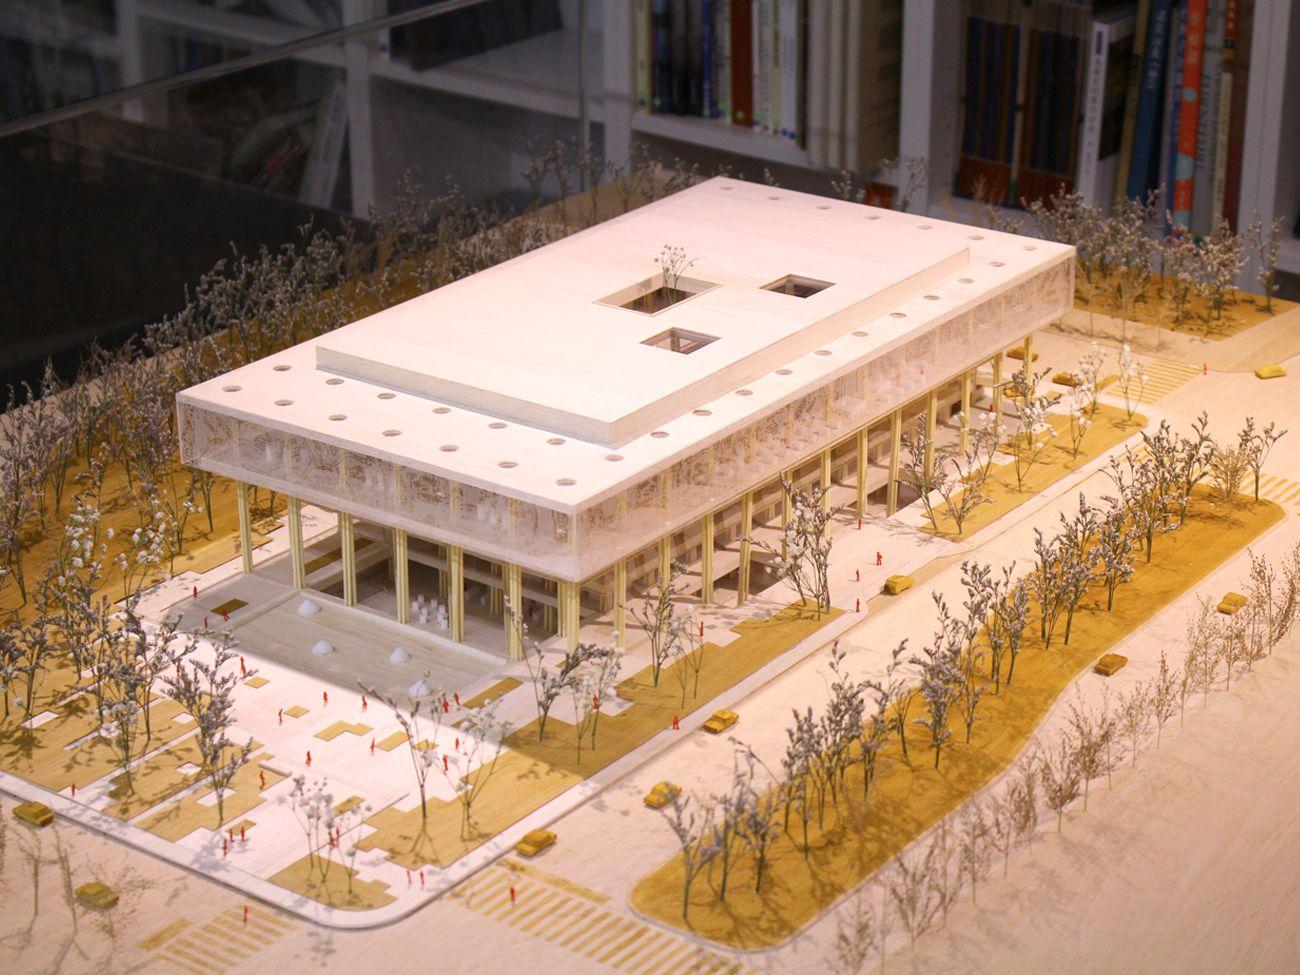 Tainan Public Library Taiwan